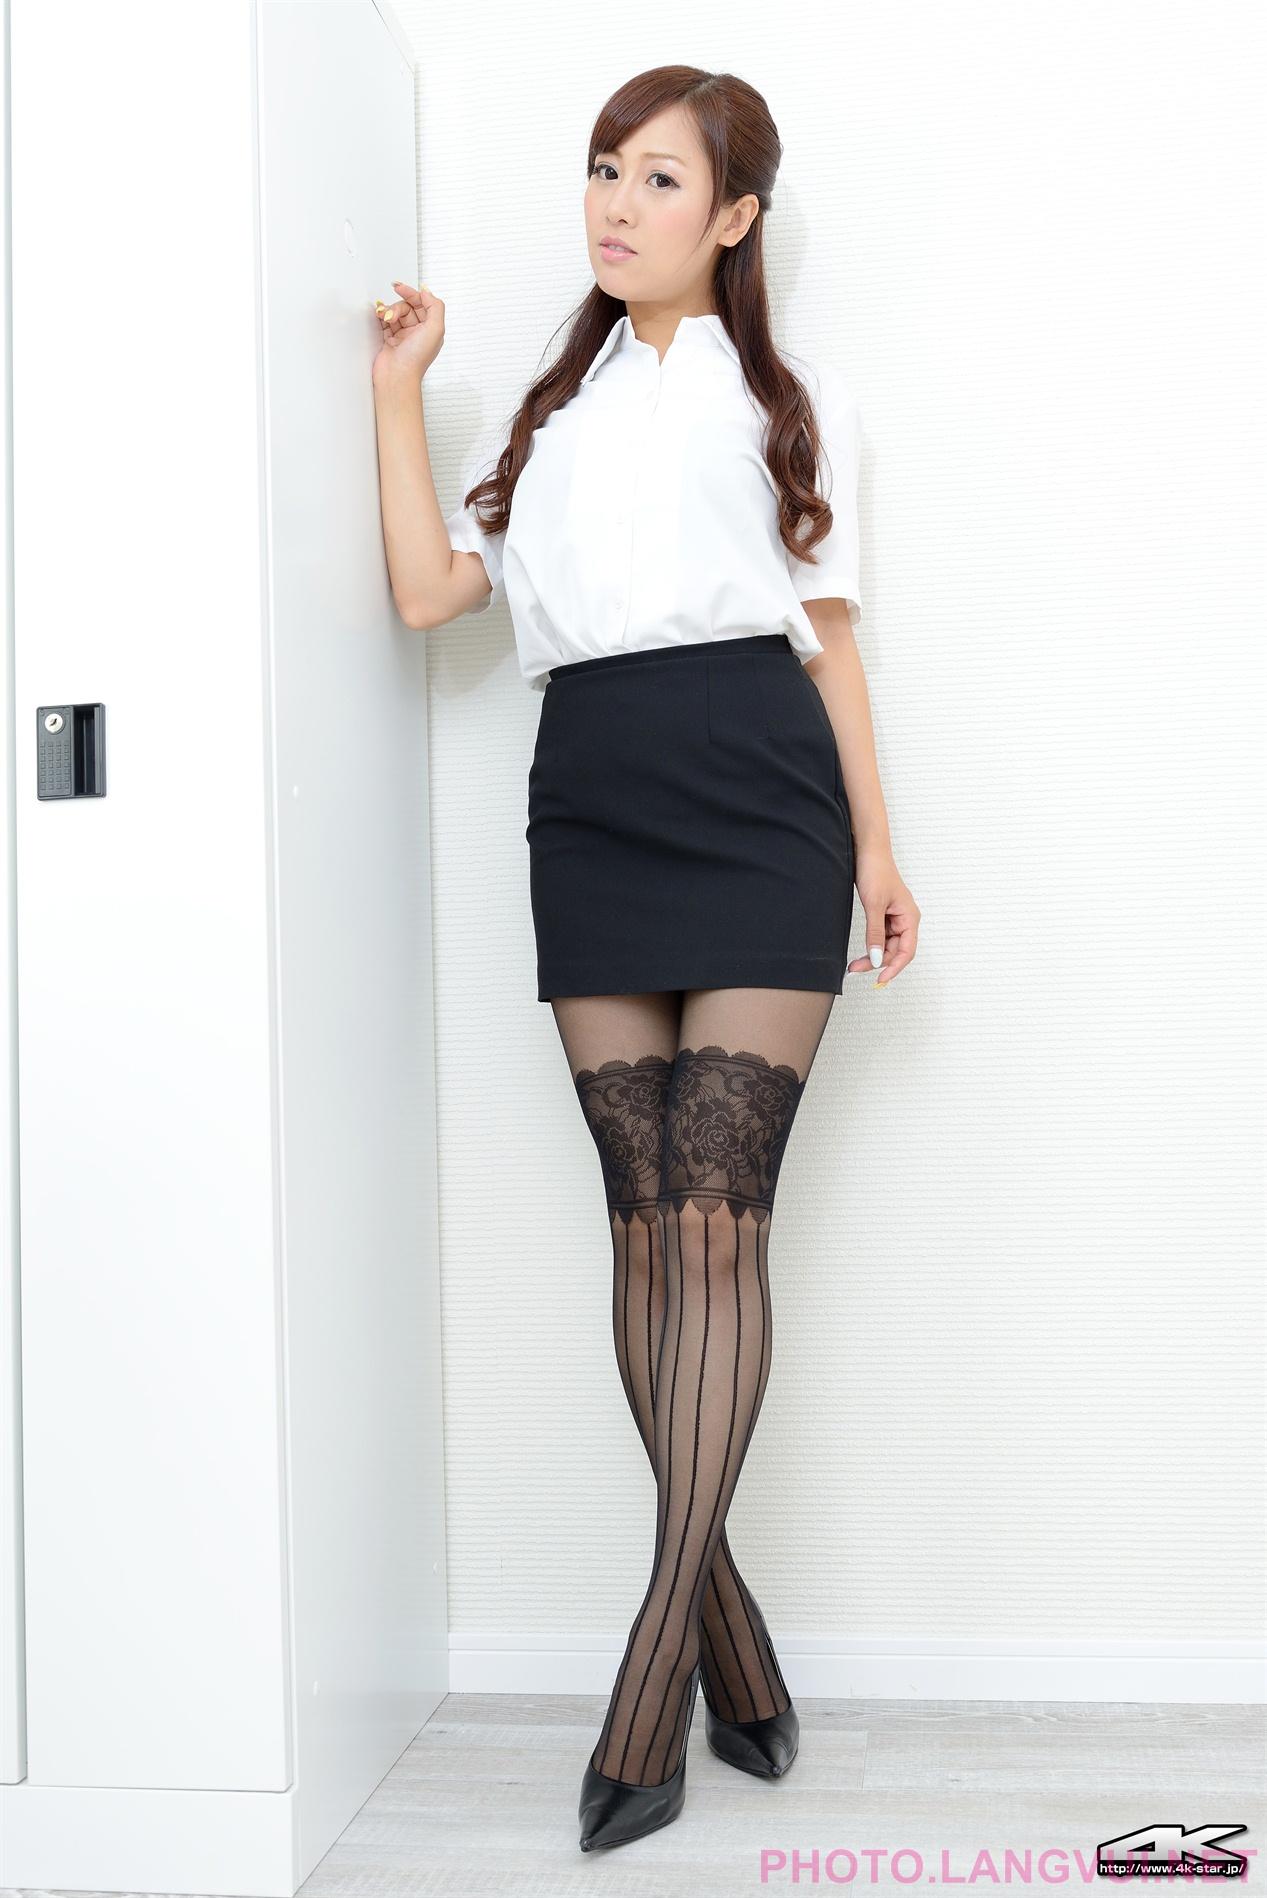 4K STAR No 00541 Karen Takedaima